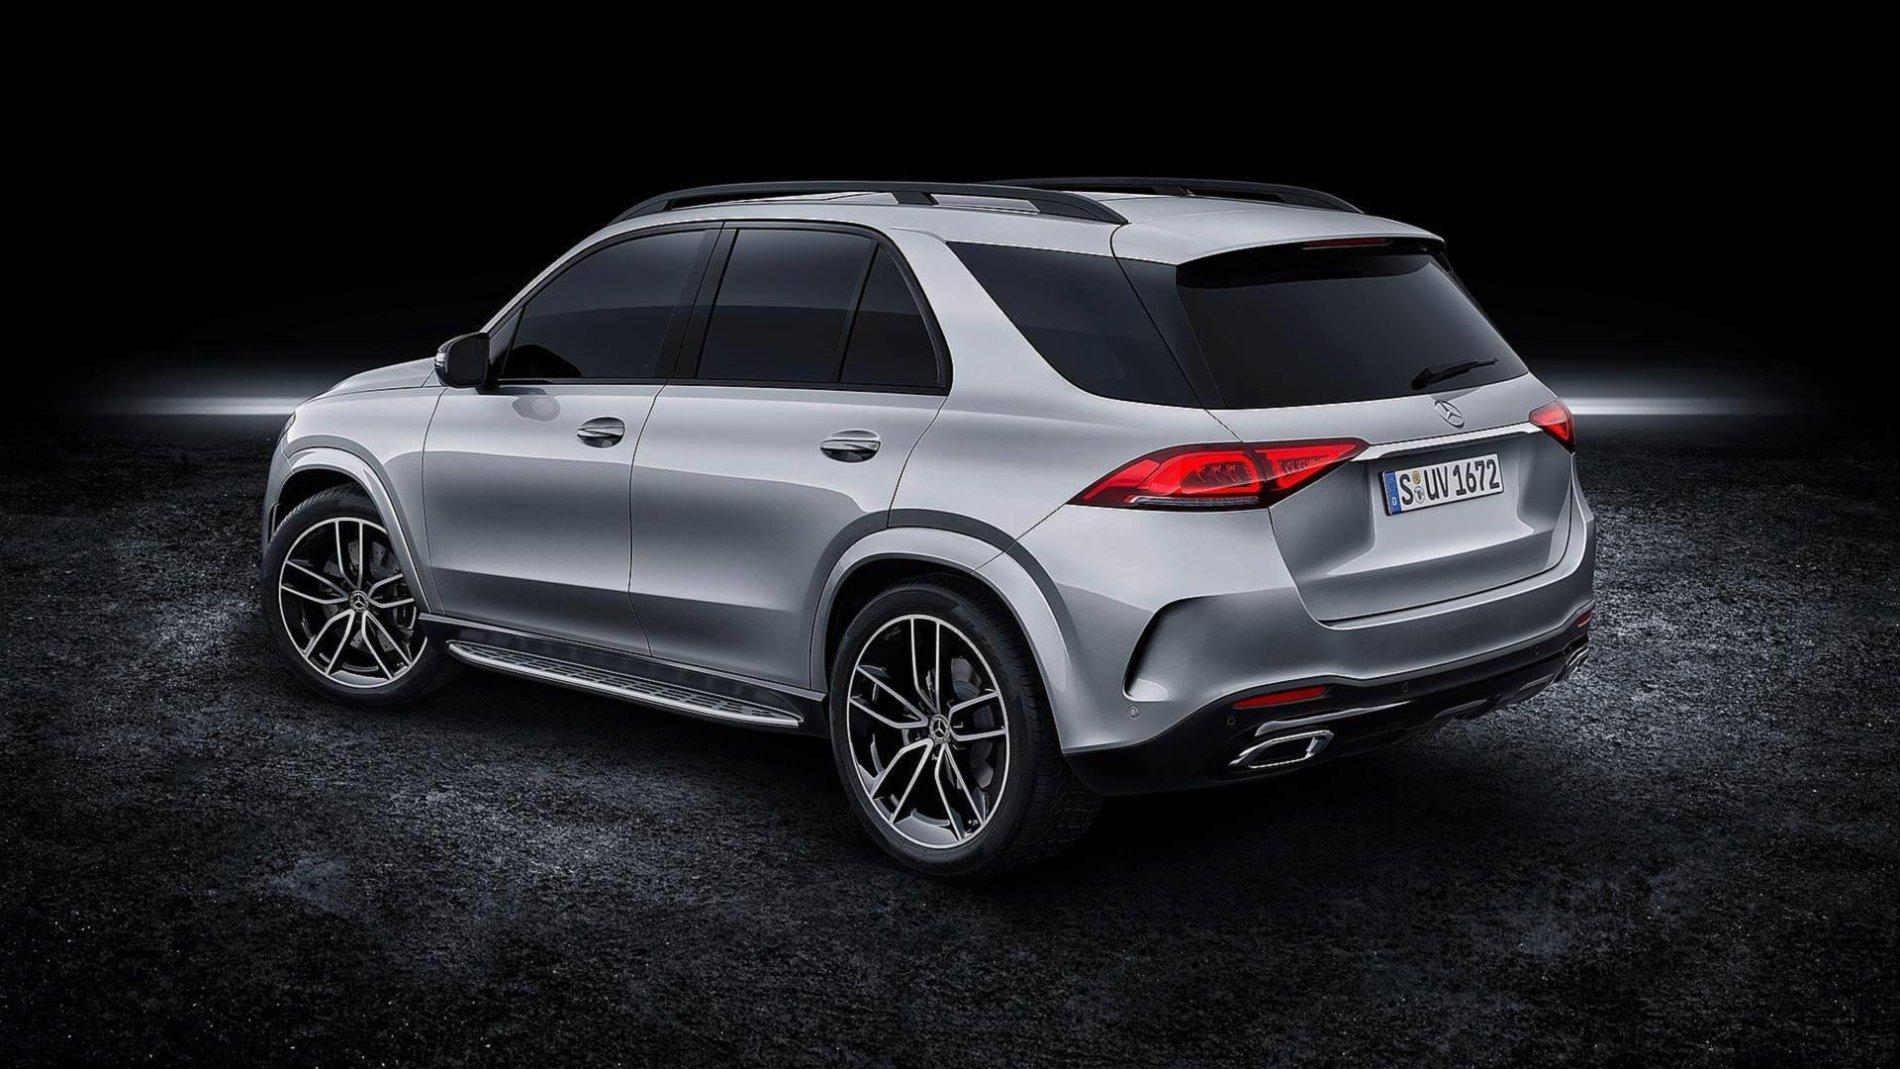 2019 Mercedes-Benz GLE - 2019 Mercedes-Benz GLE